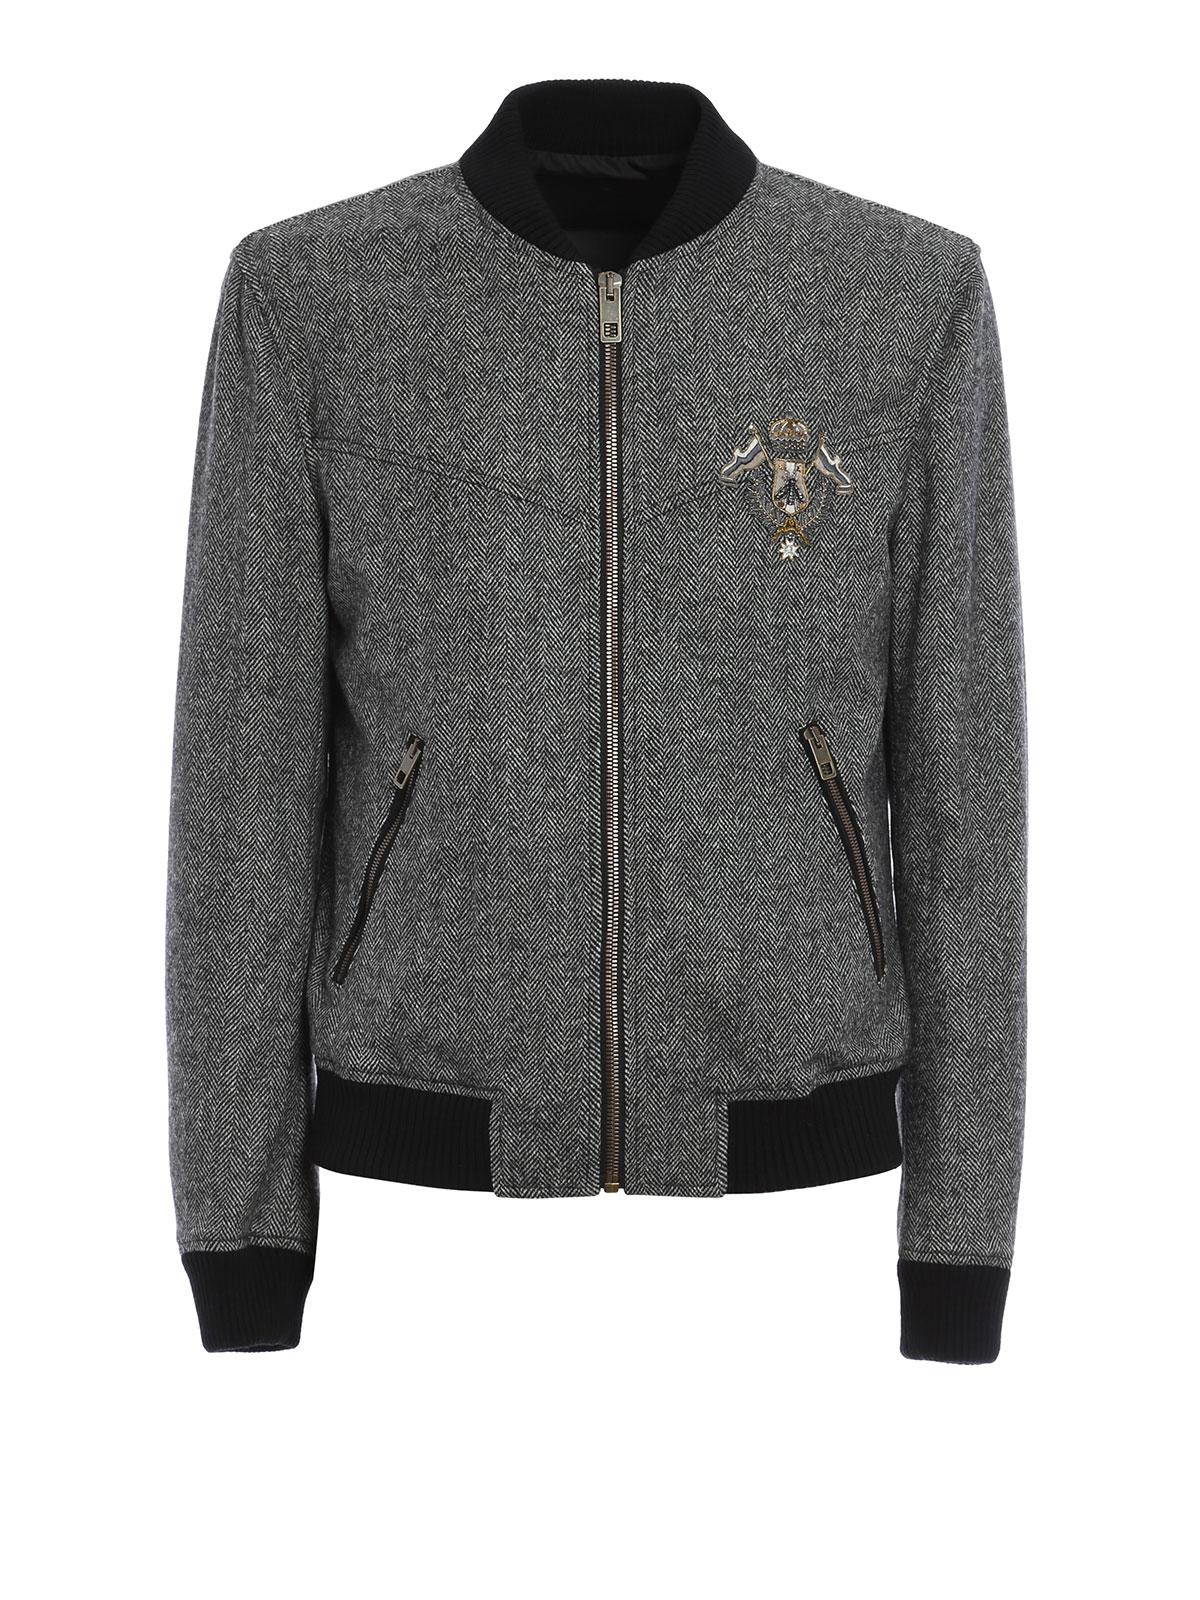 88ff7d83c Dolce & Gabbana - Heraldic Sicilia wool bomber jacket - bombers ...